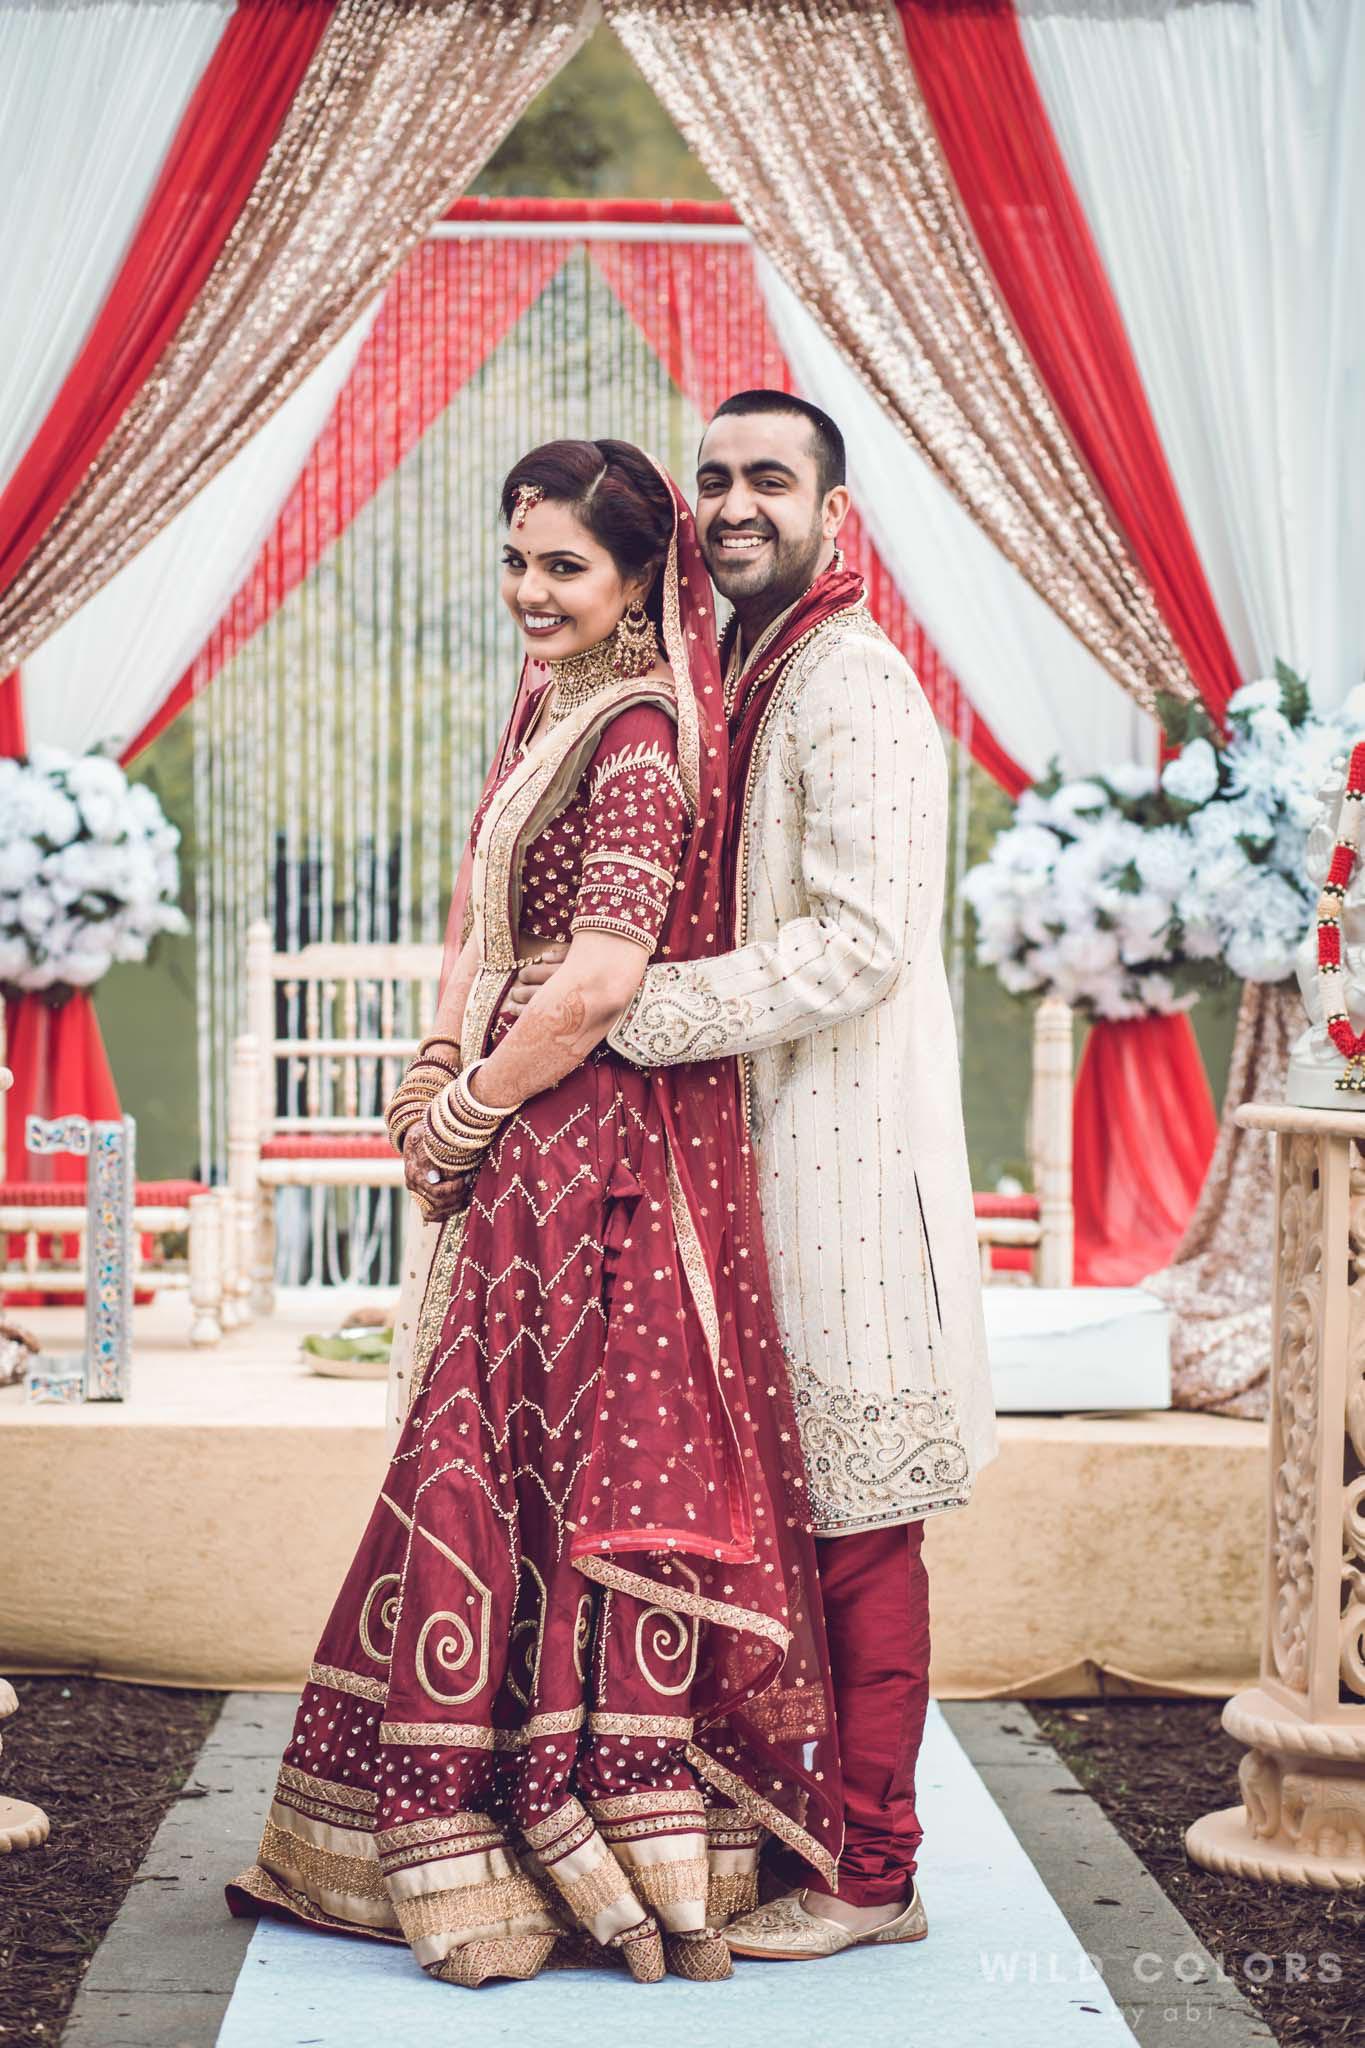 CANDID_INDIAN_WEDDING_ATLANTA_PHOTOGRAPHER-26.JPG